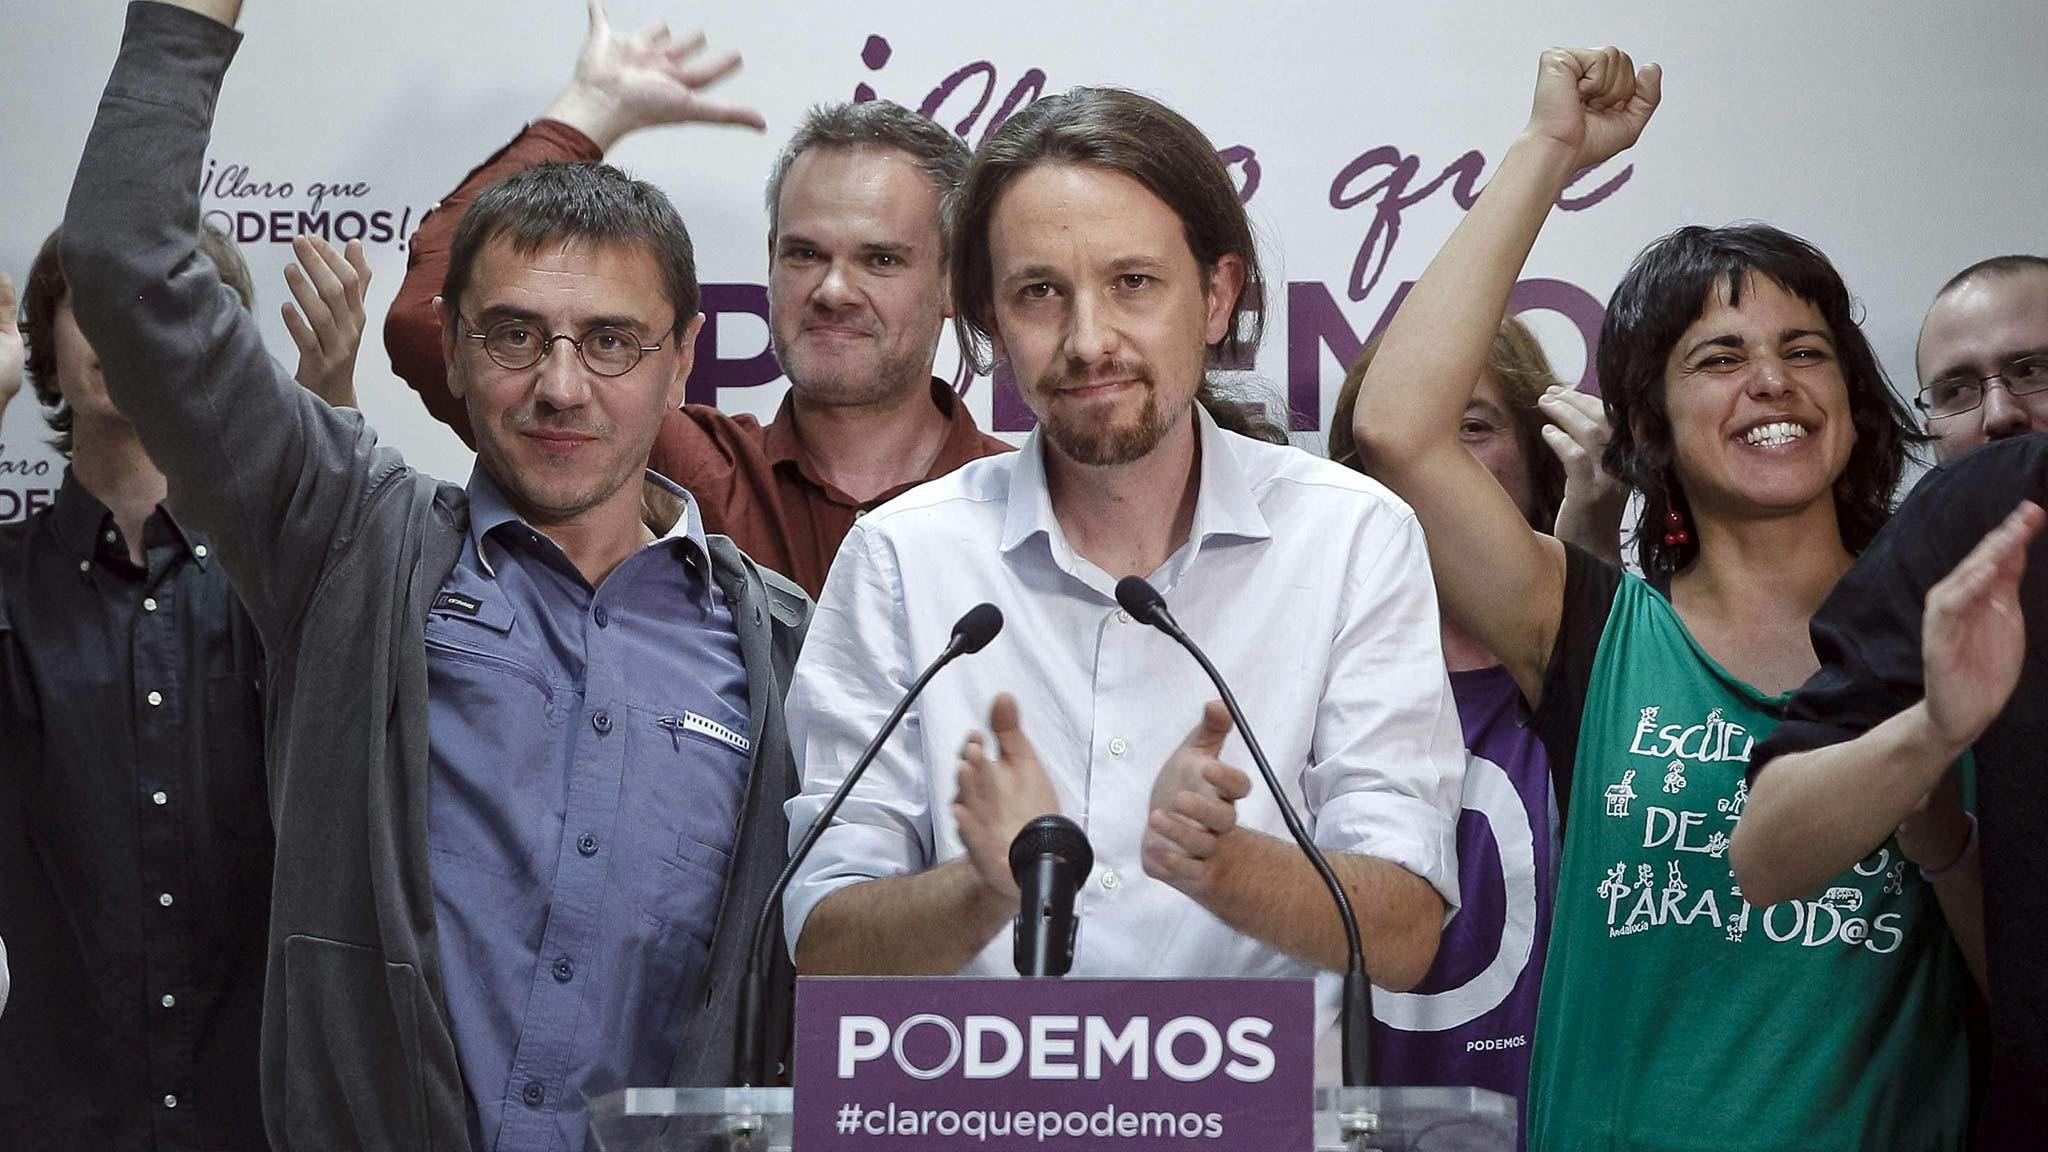 A propos de Podemos: débat avec François Sabado